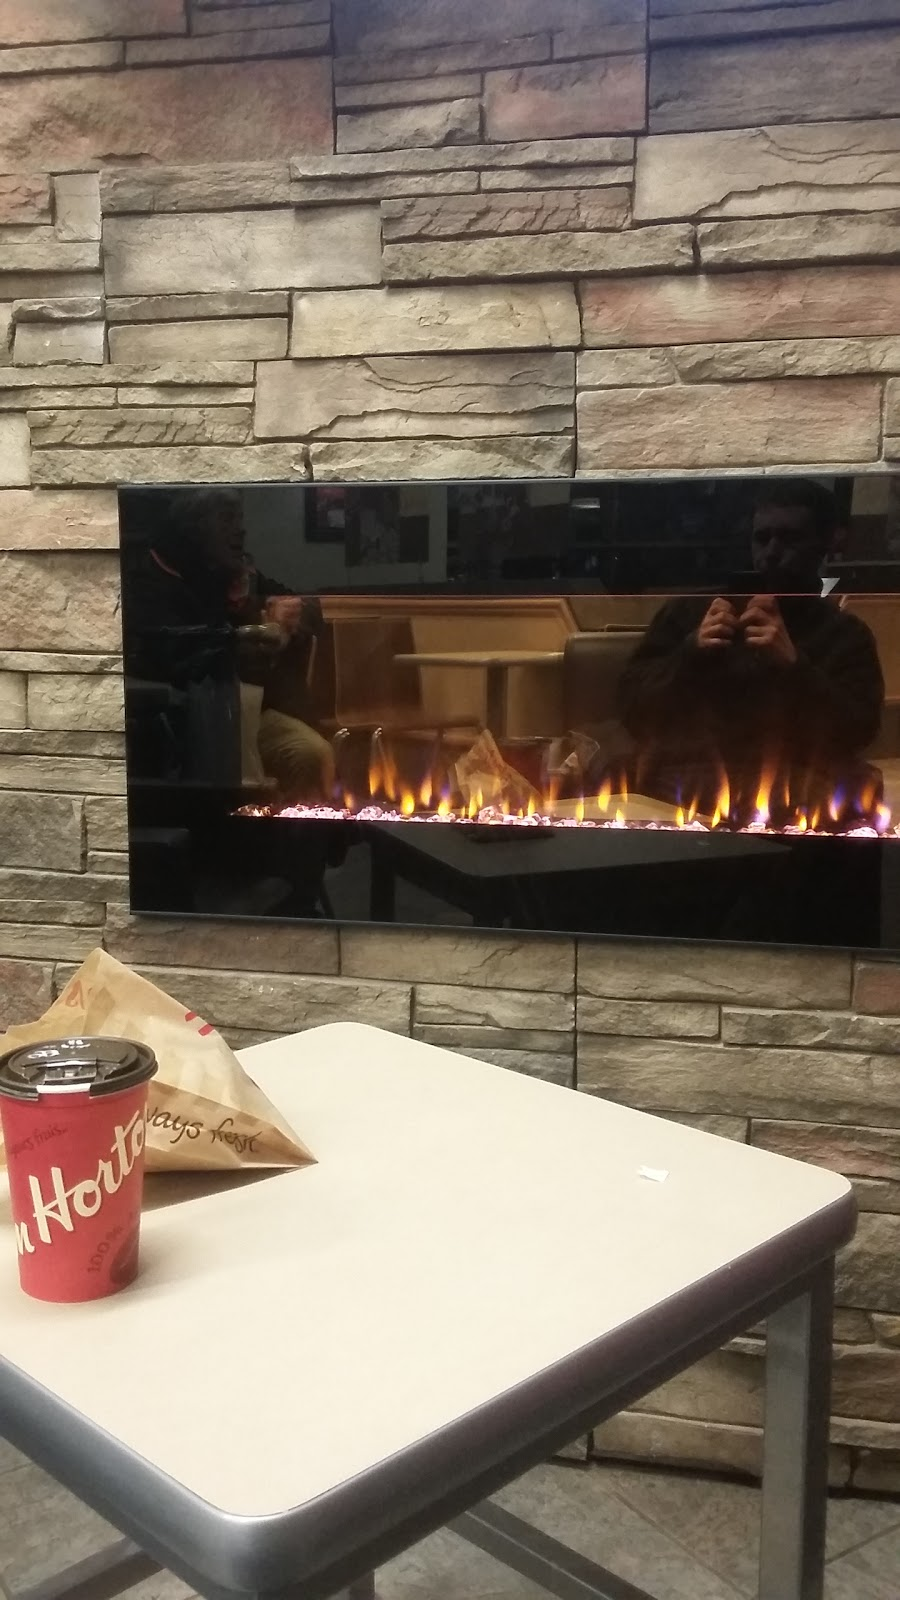 Tim Hortons | cafe | 1840 Main St, Moncton, NB E1E 1H7, Canada | 5068627658 OR +1 506-862-7658